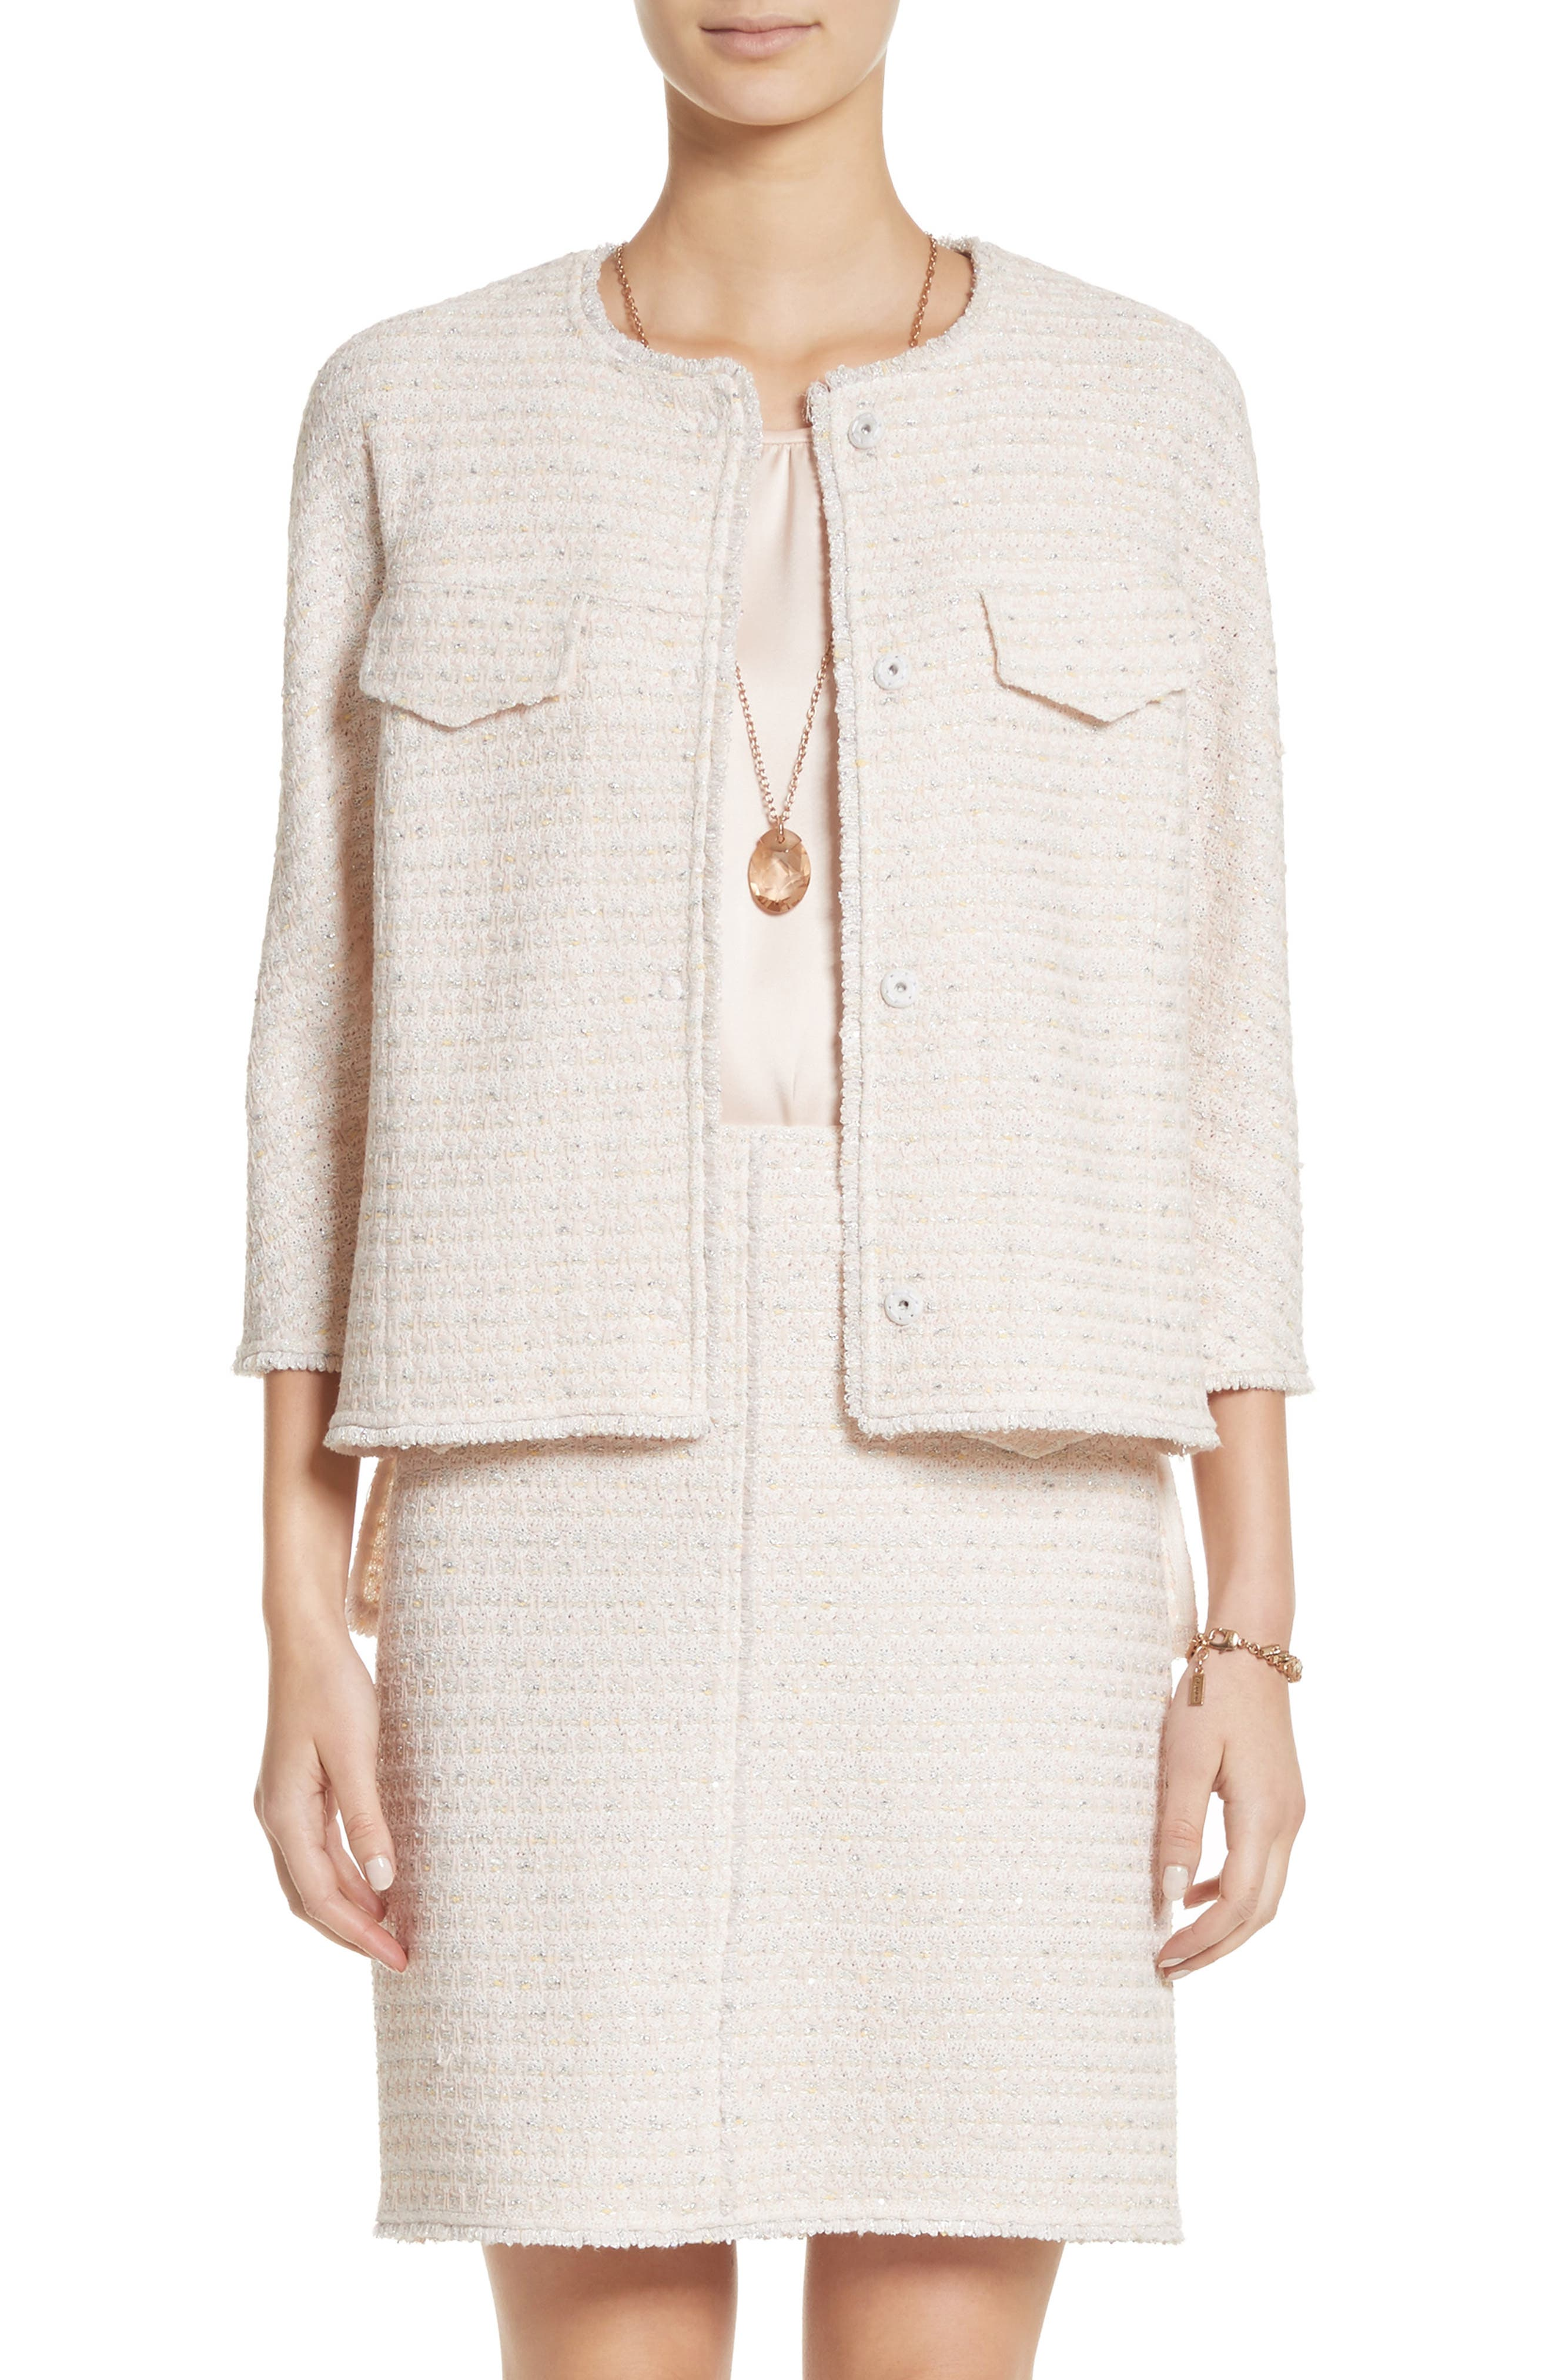 St. John Collection Metallic Tweed Jacket